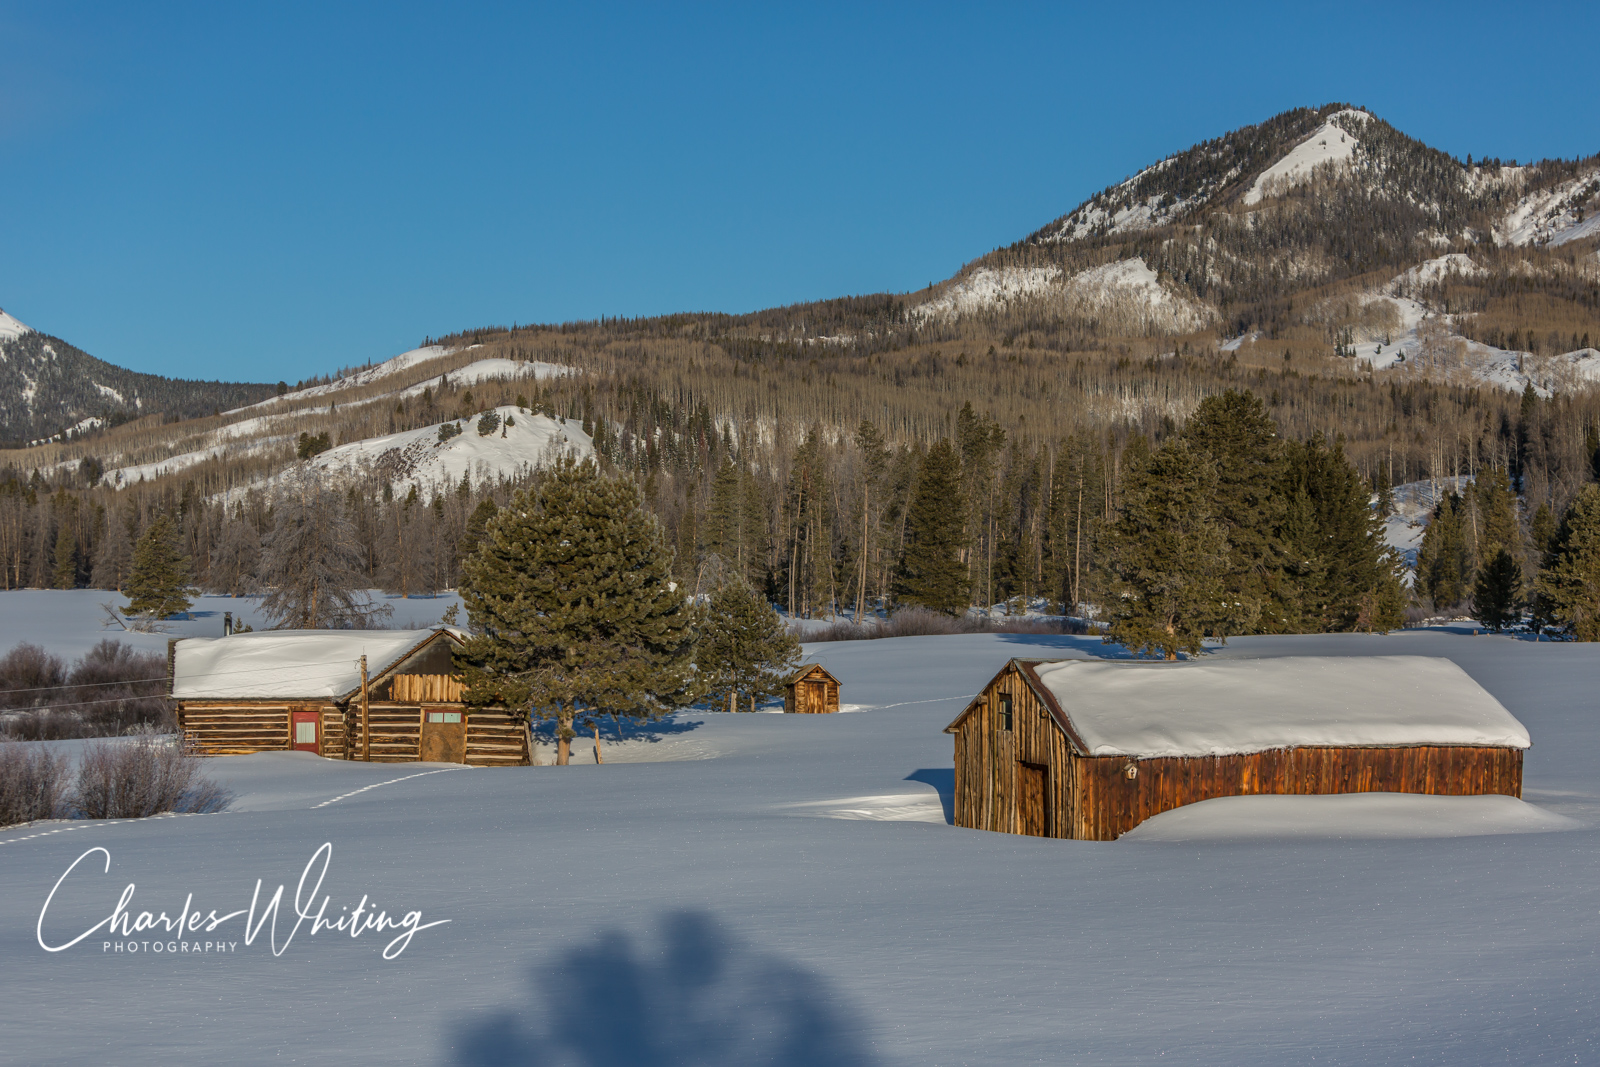 Homestead, snow, Steamboat Springs, Colorado, photo